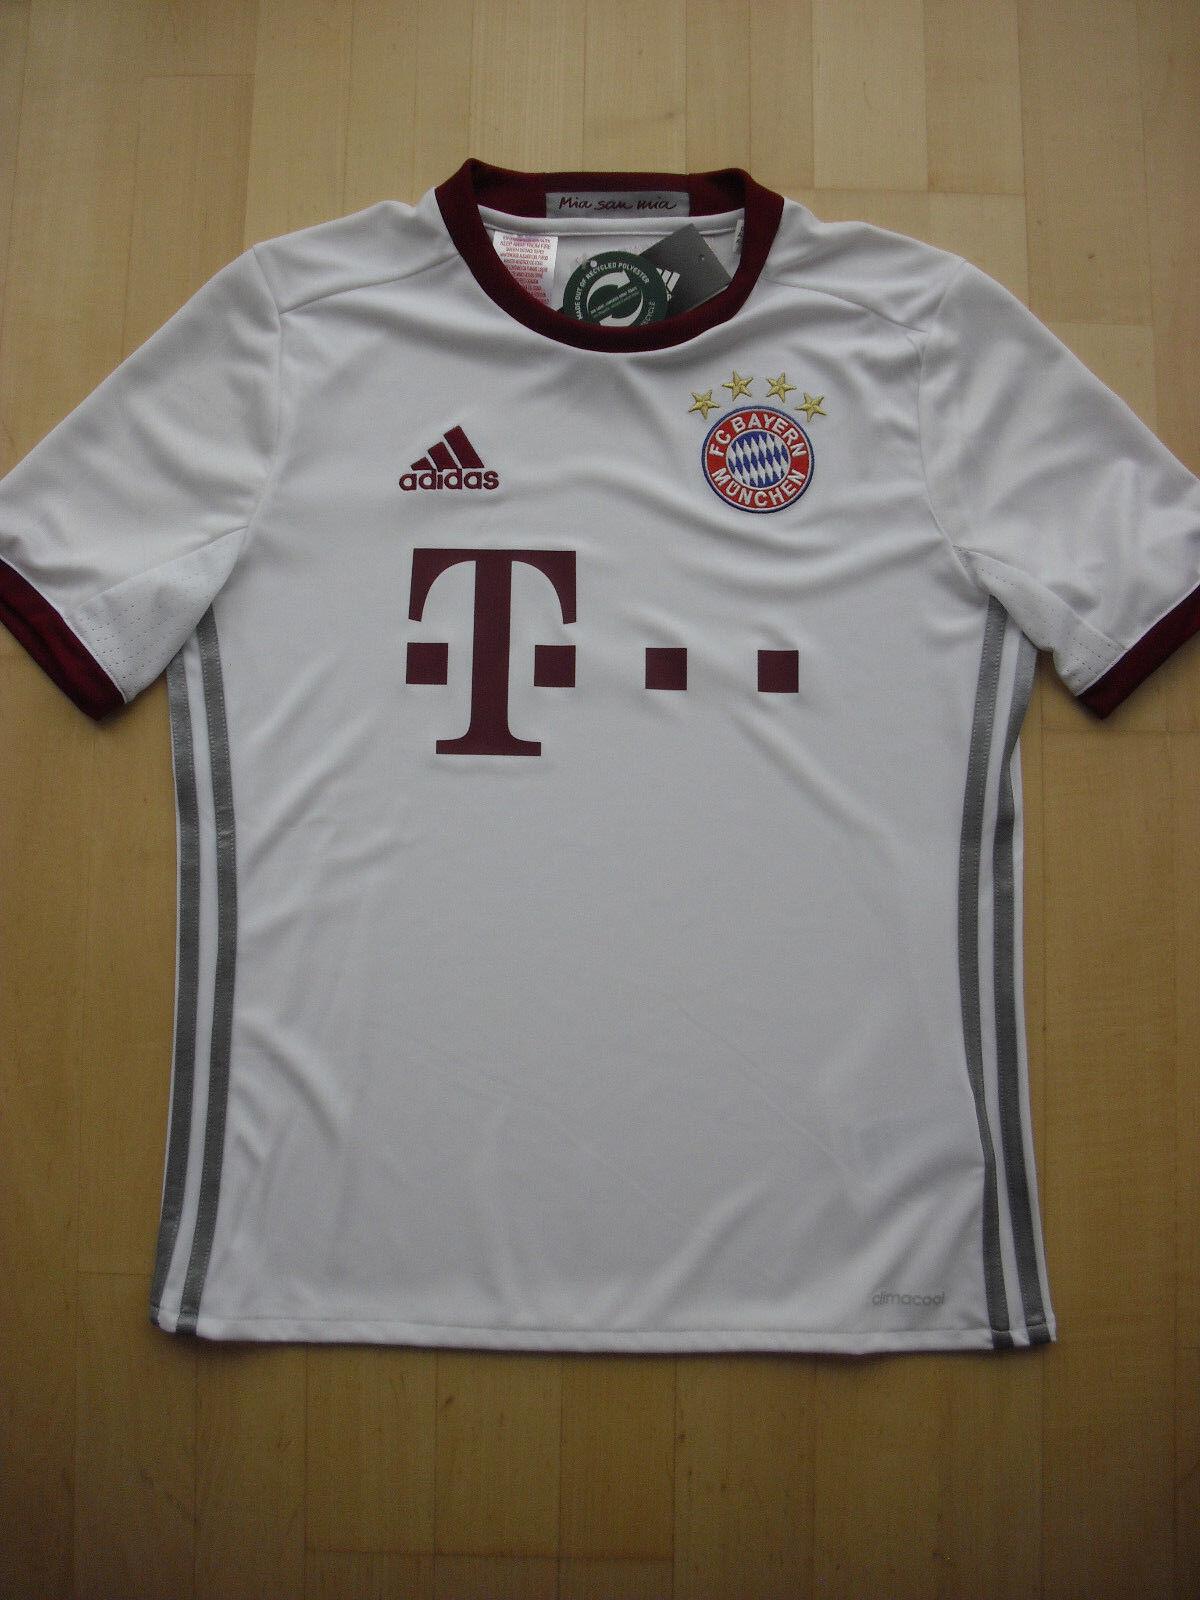 Trikot Champions League FC Bayern München adidas 2016 2017 Größe M - XXXL SALE